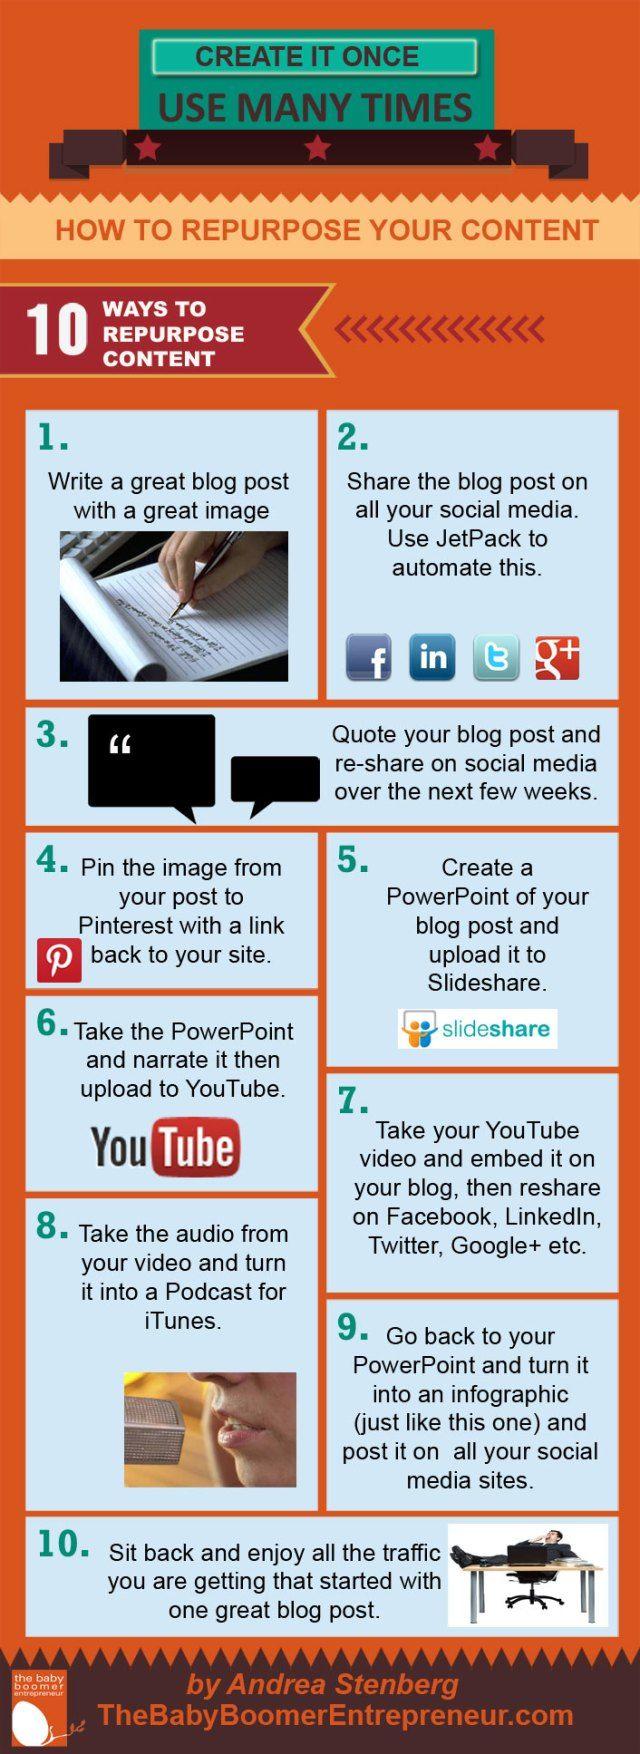 10 ways to repurpose content #infografia #infographic #ContentMarketing